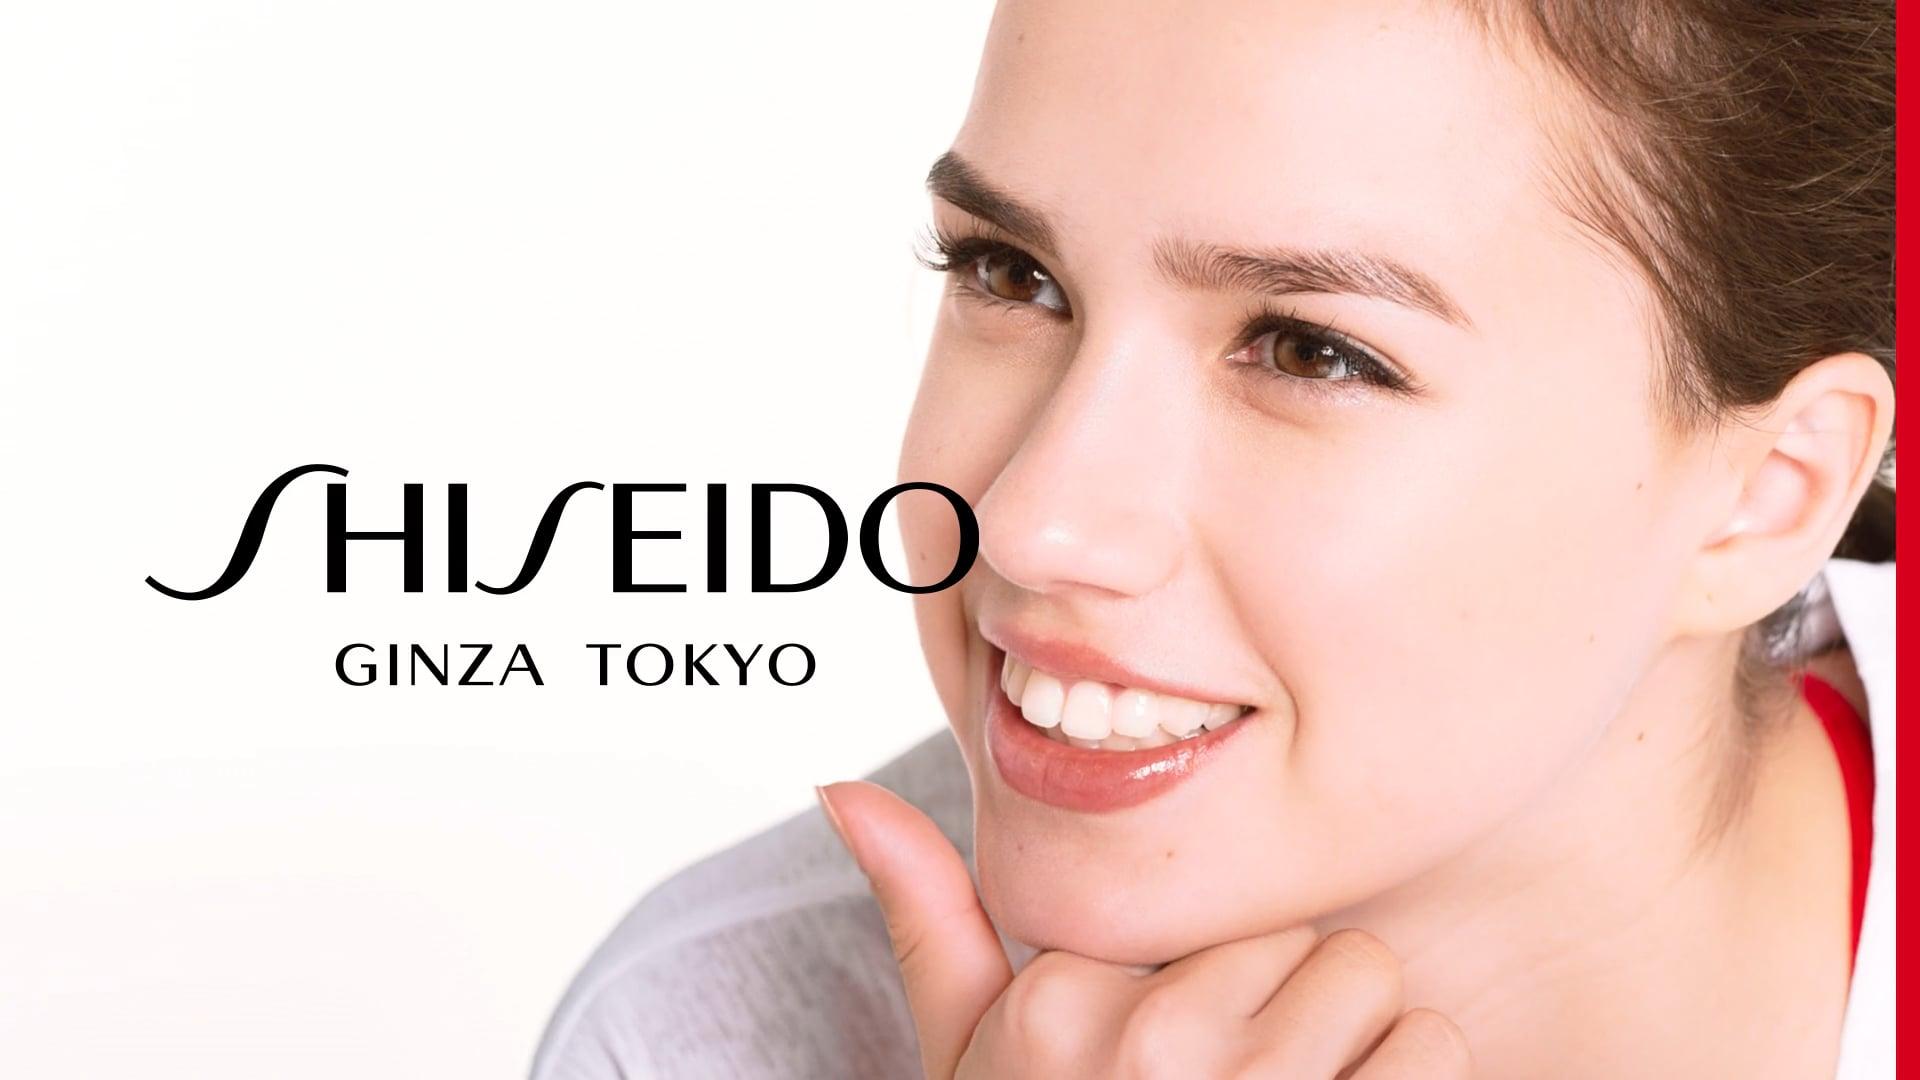 Shiseido Alina Zagitova